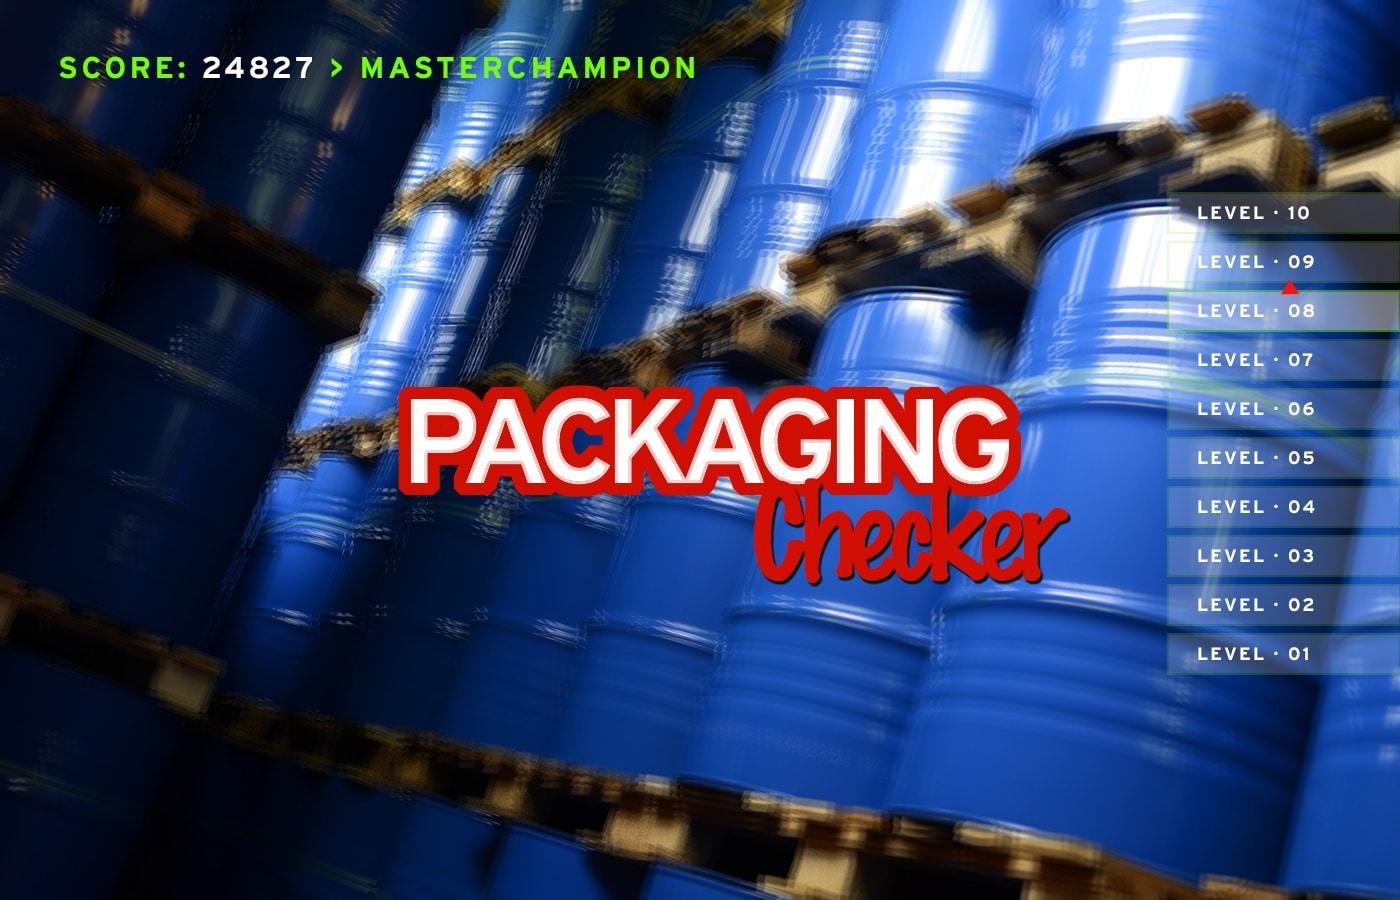 Packaging_Gamescom @ Wedthoff_Industrieverpackungen_Gefahrgutverpackungen NRW Köln